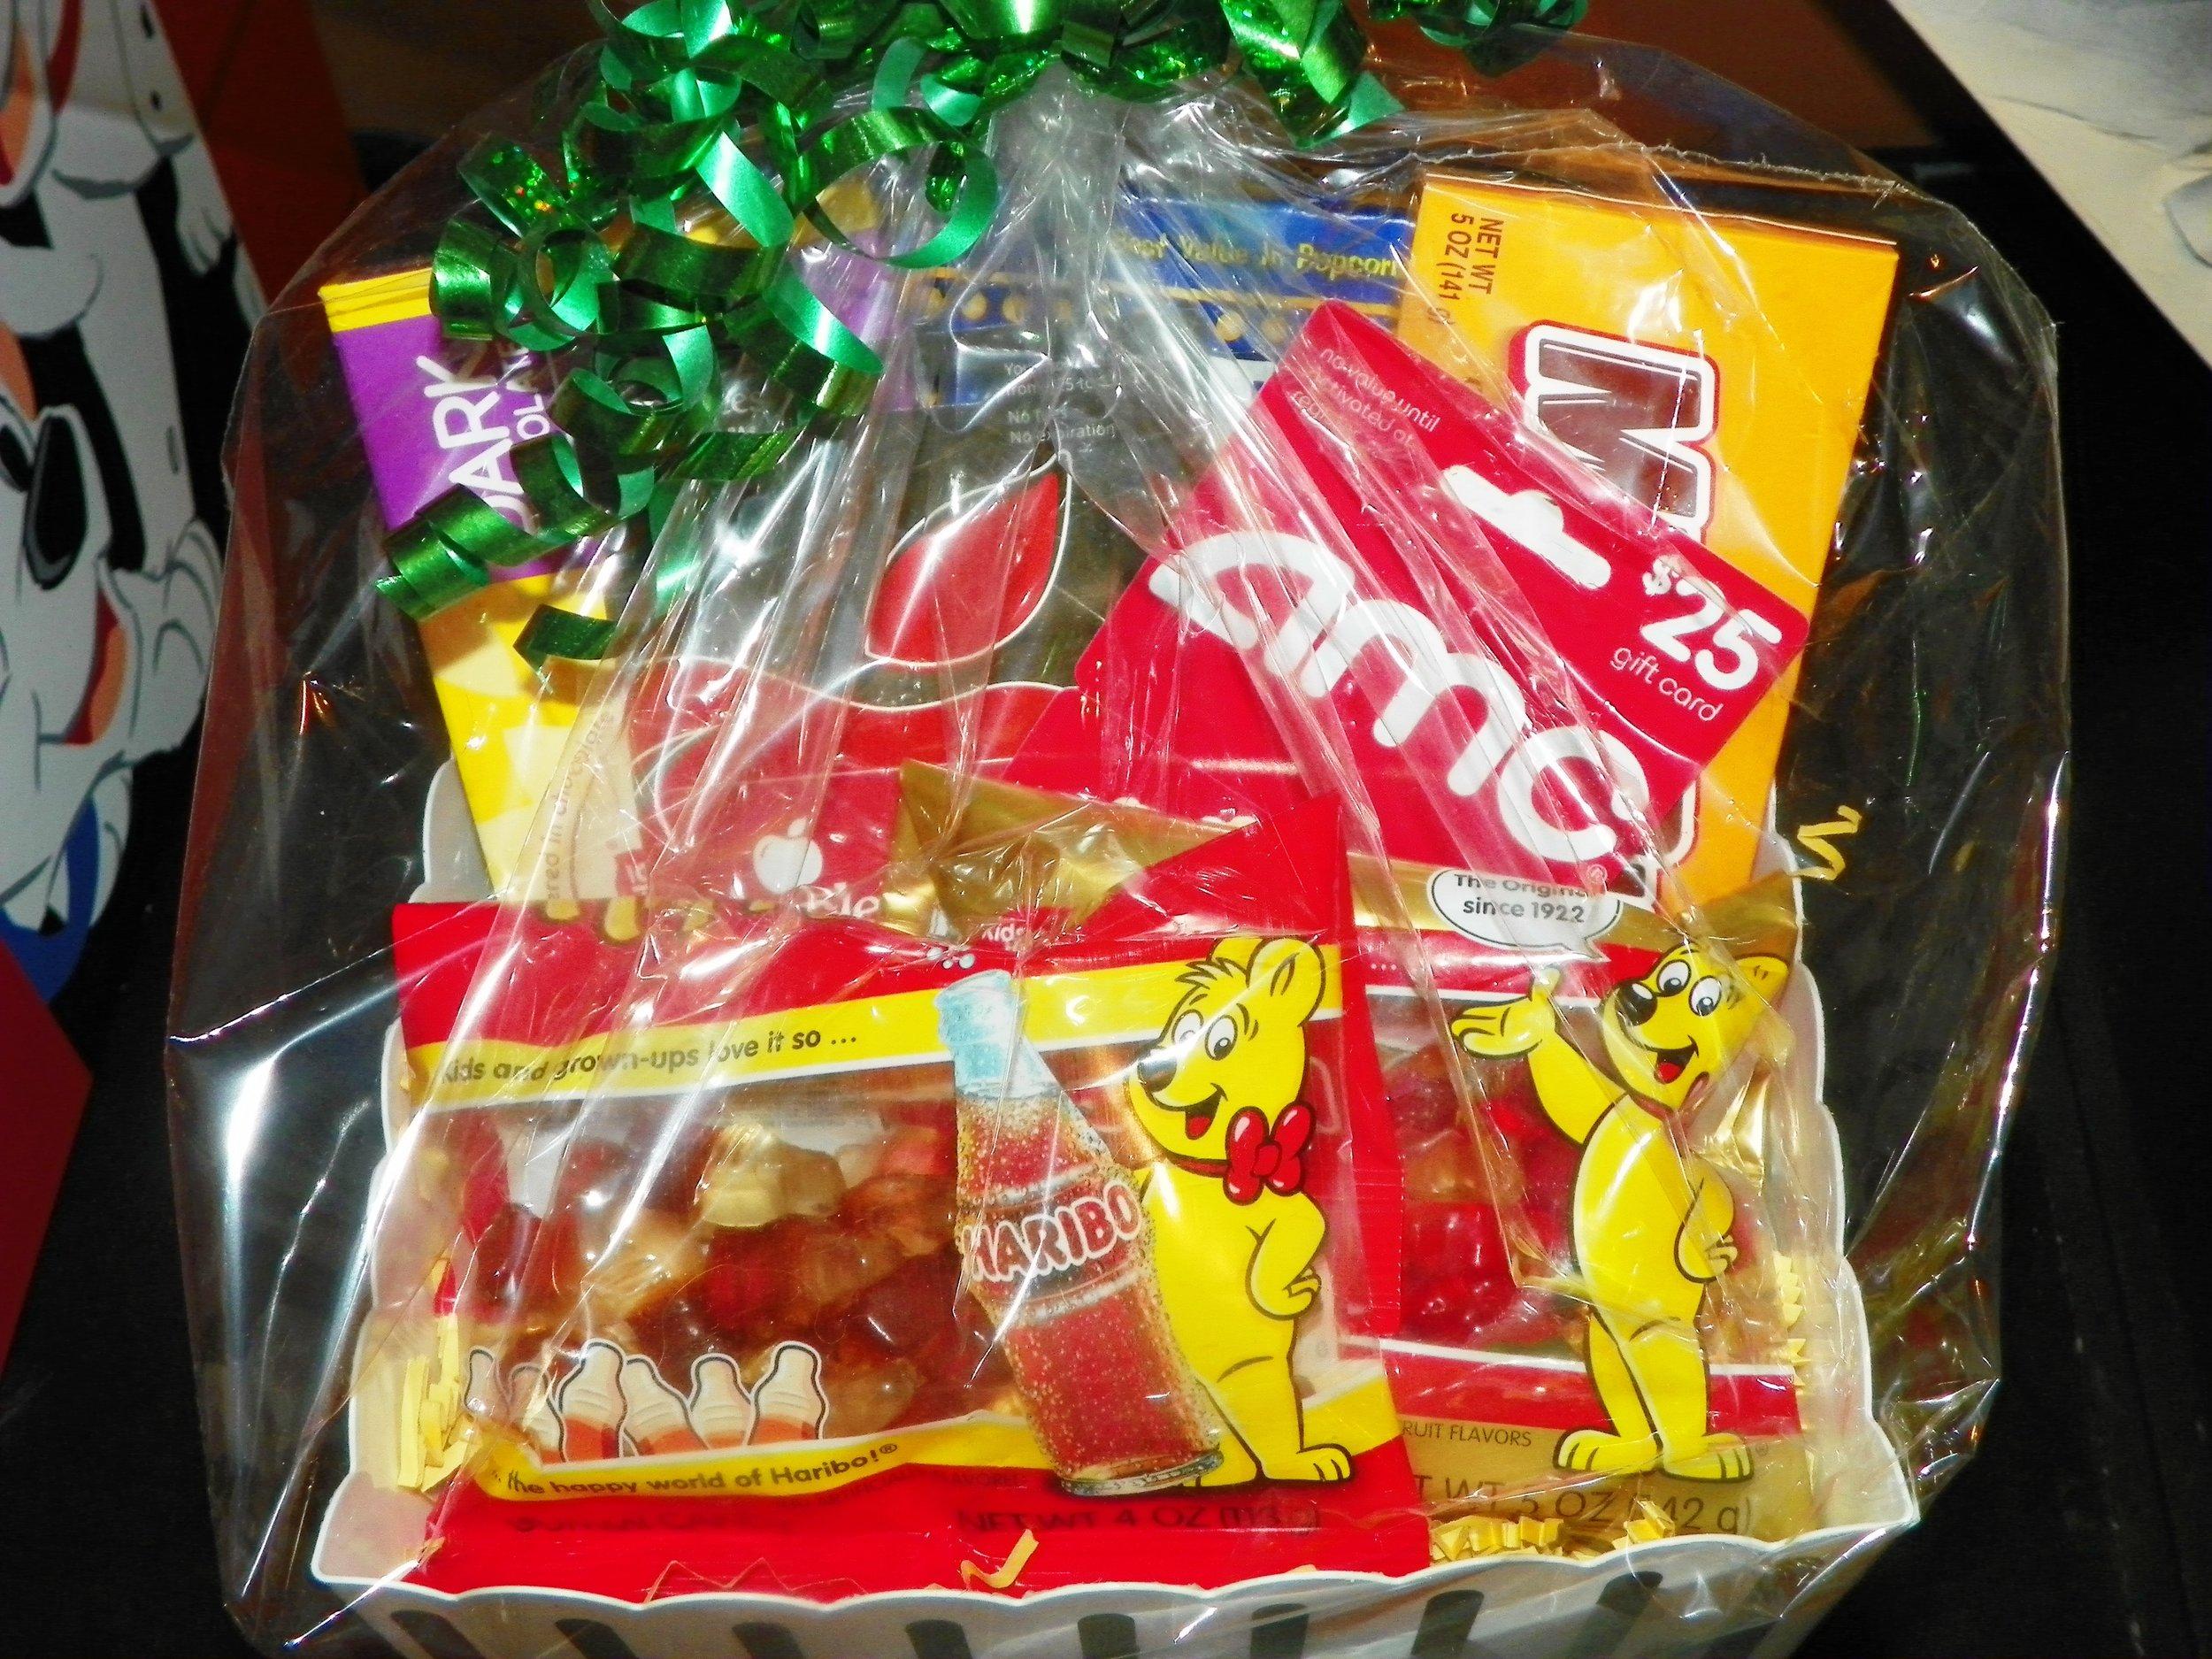 The Popcorn  box -  popcorn, candy, $25.00 AMZ gift card a Applebees Gift card